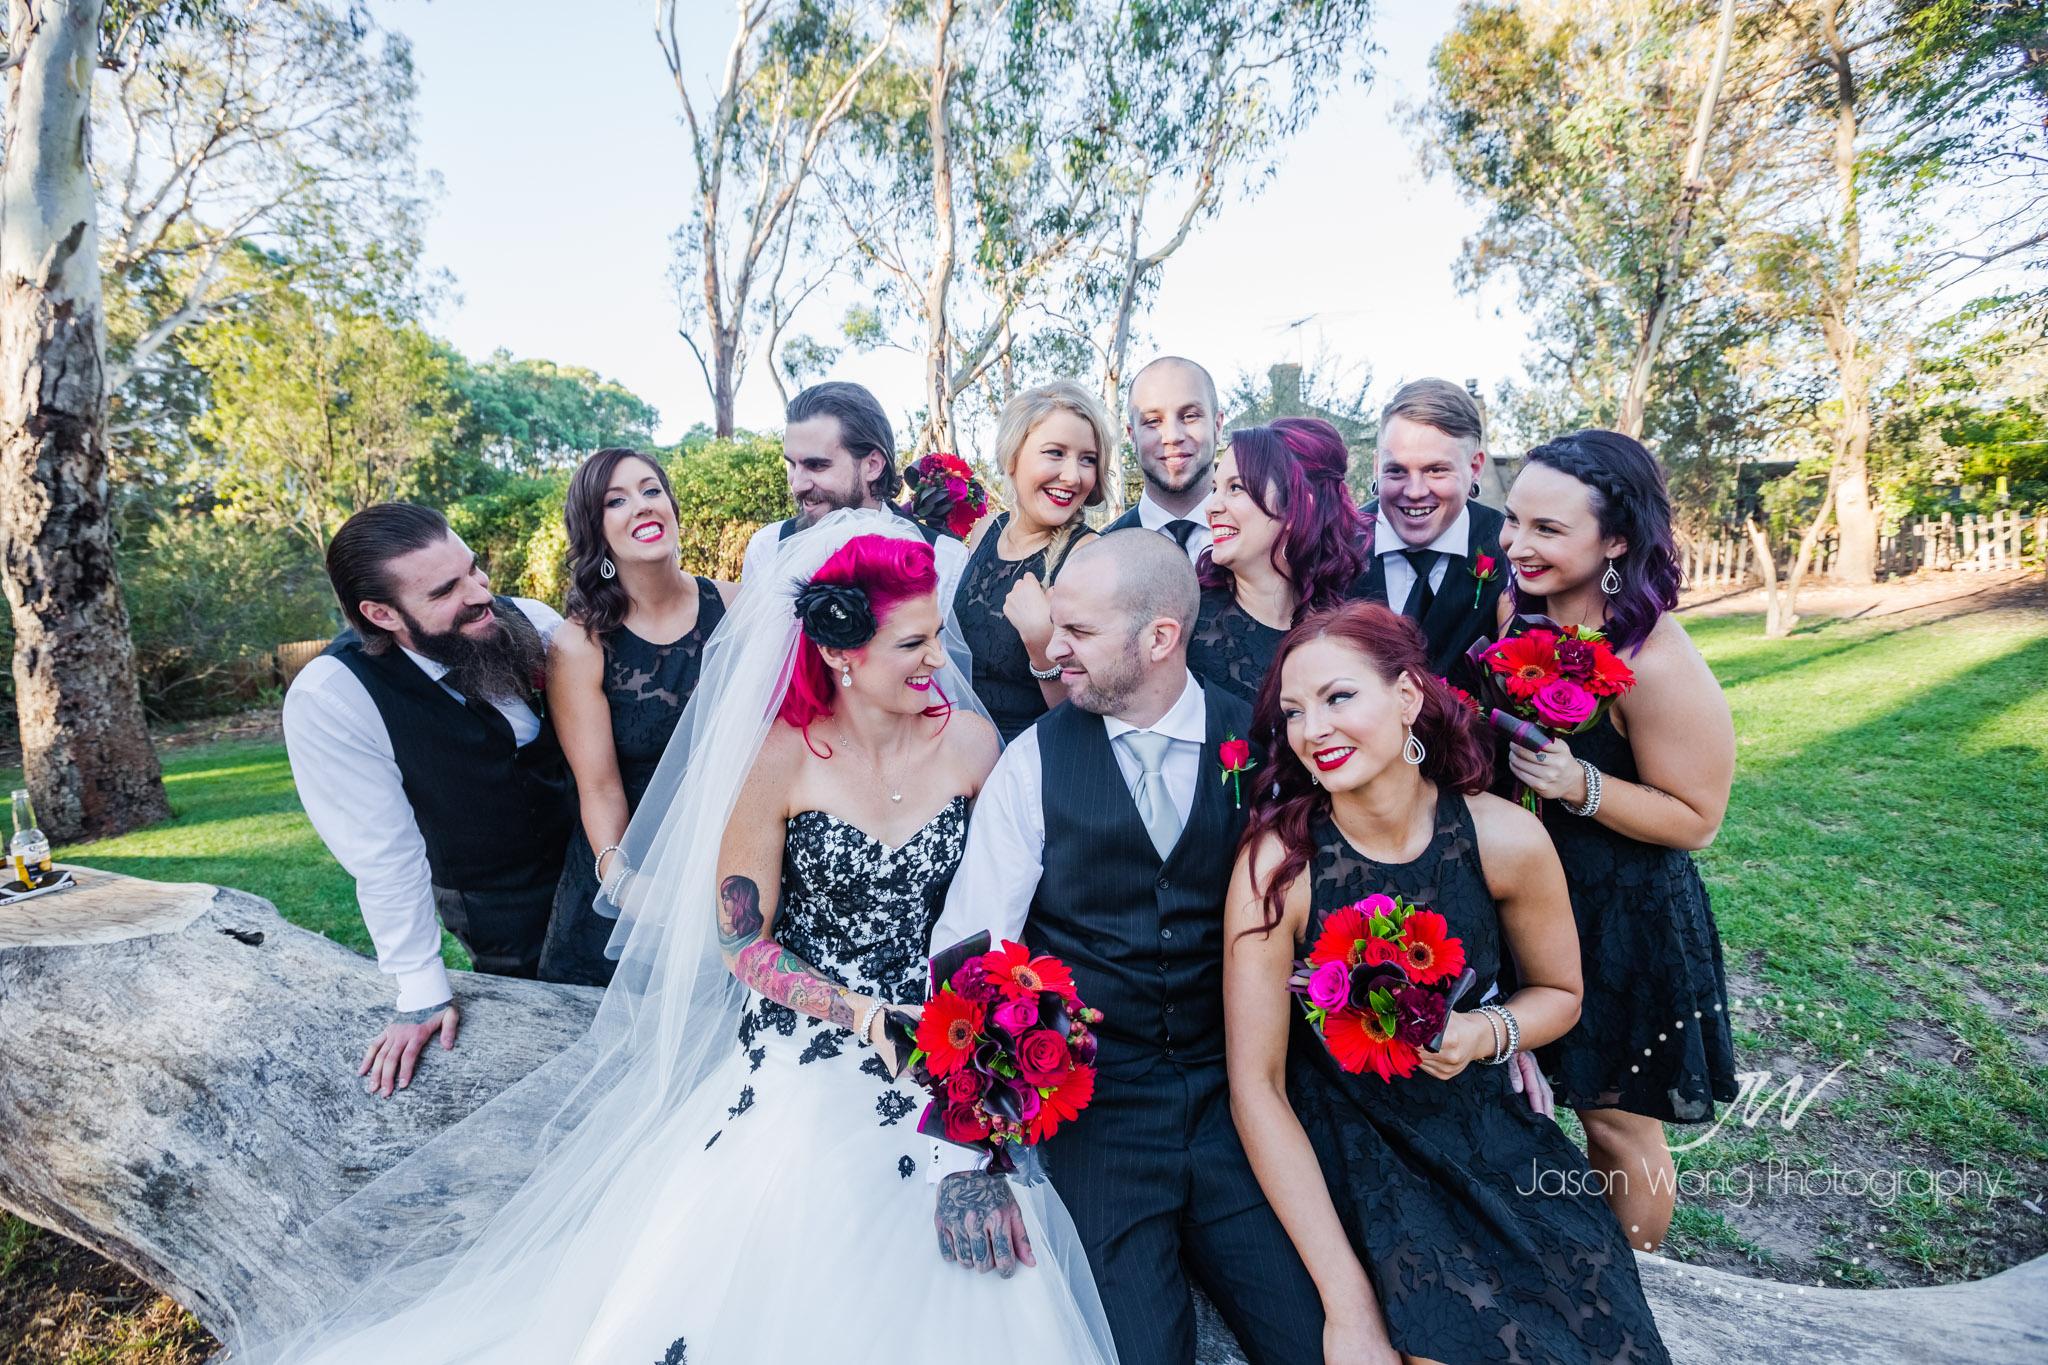 wedding-with-black-theme.jpg